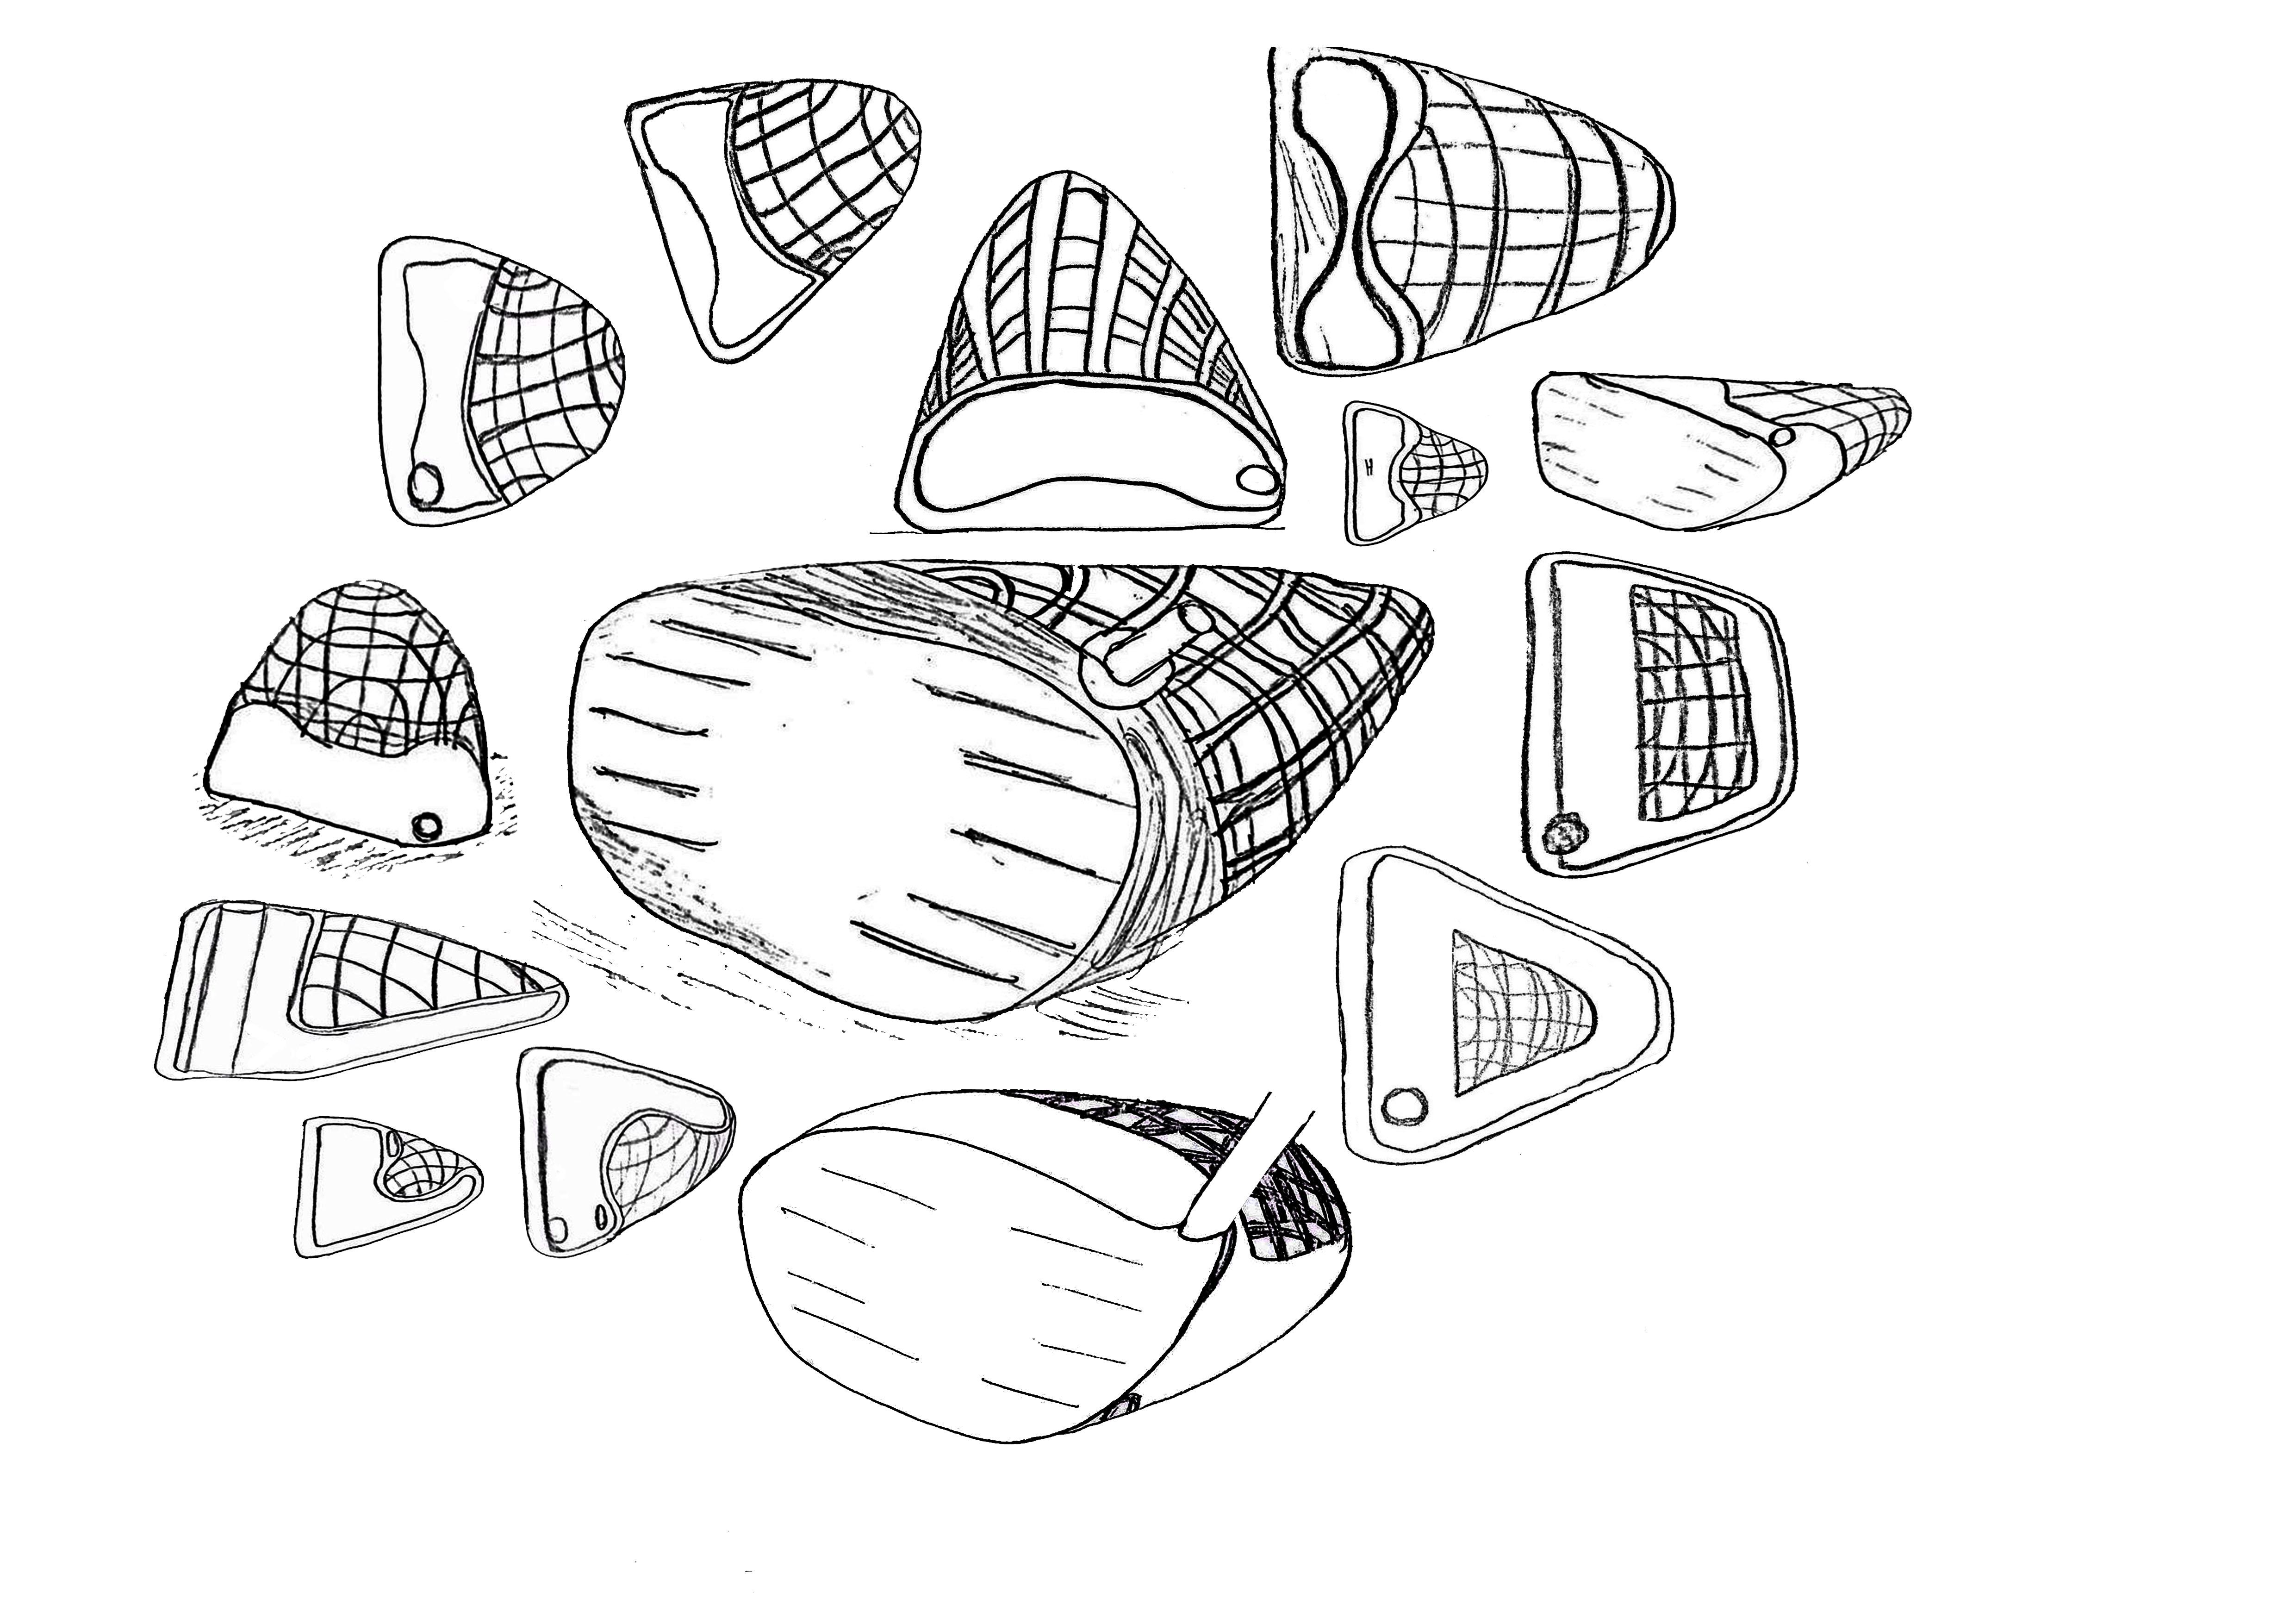 Sketches exploring lightweights